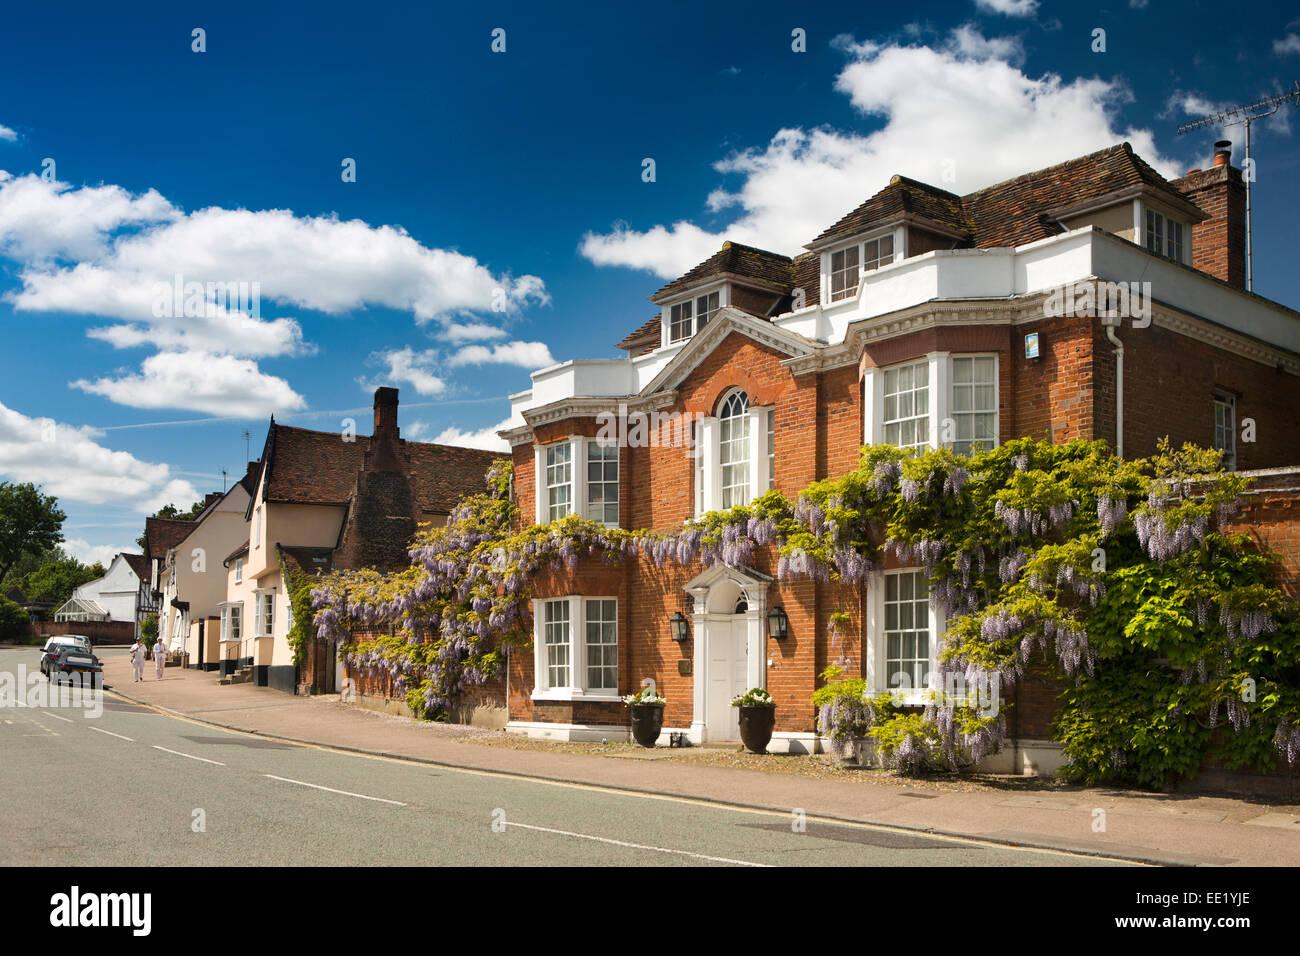 UK England, Suffolk, Lavenham, Church Street, wisteria clad Regency House - Stock Image